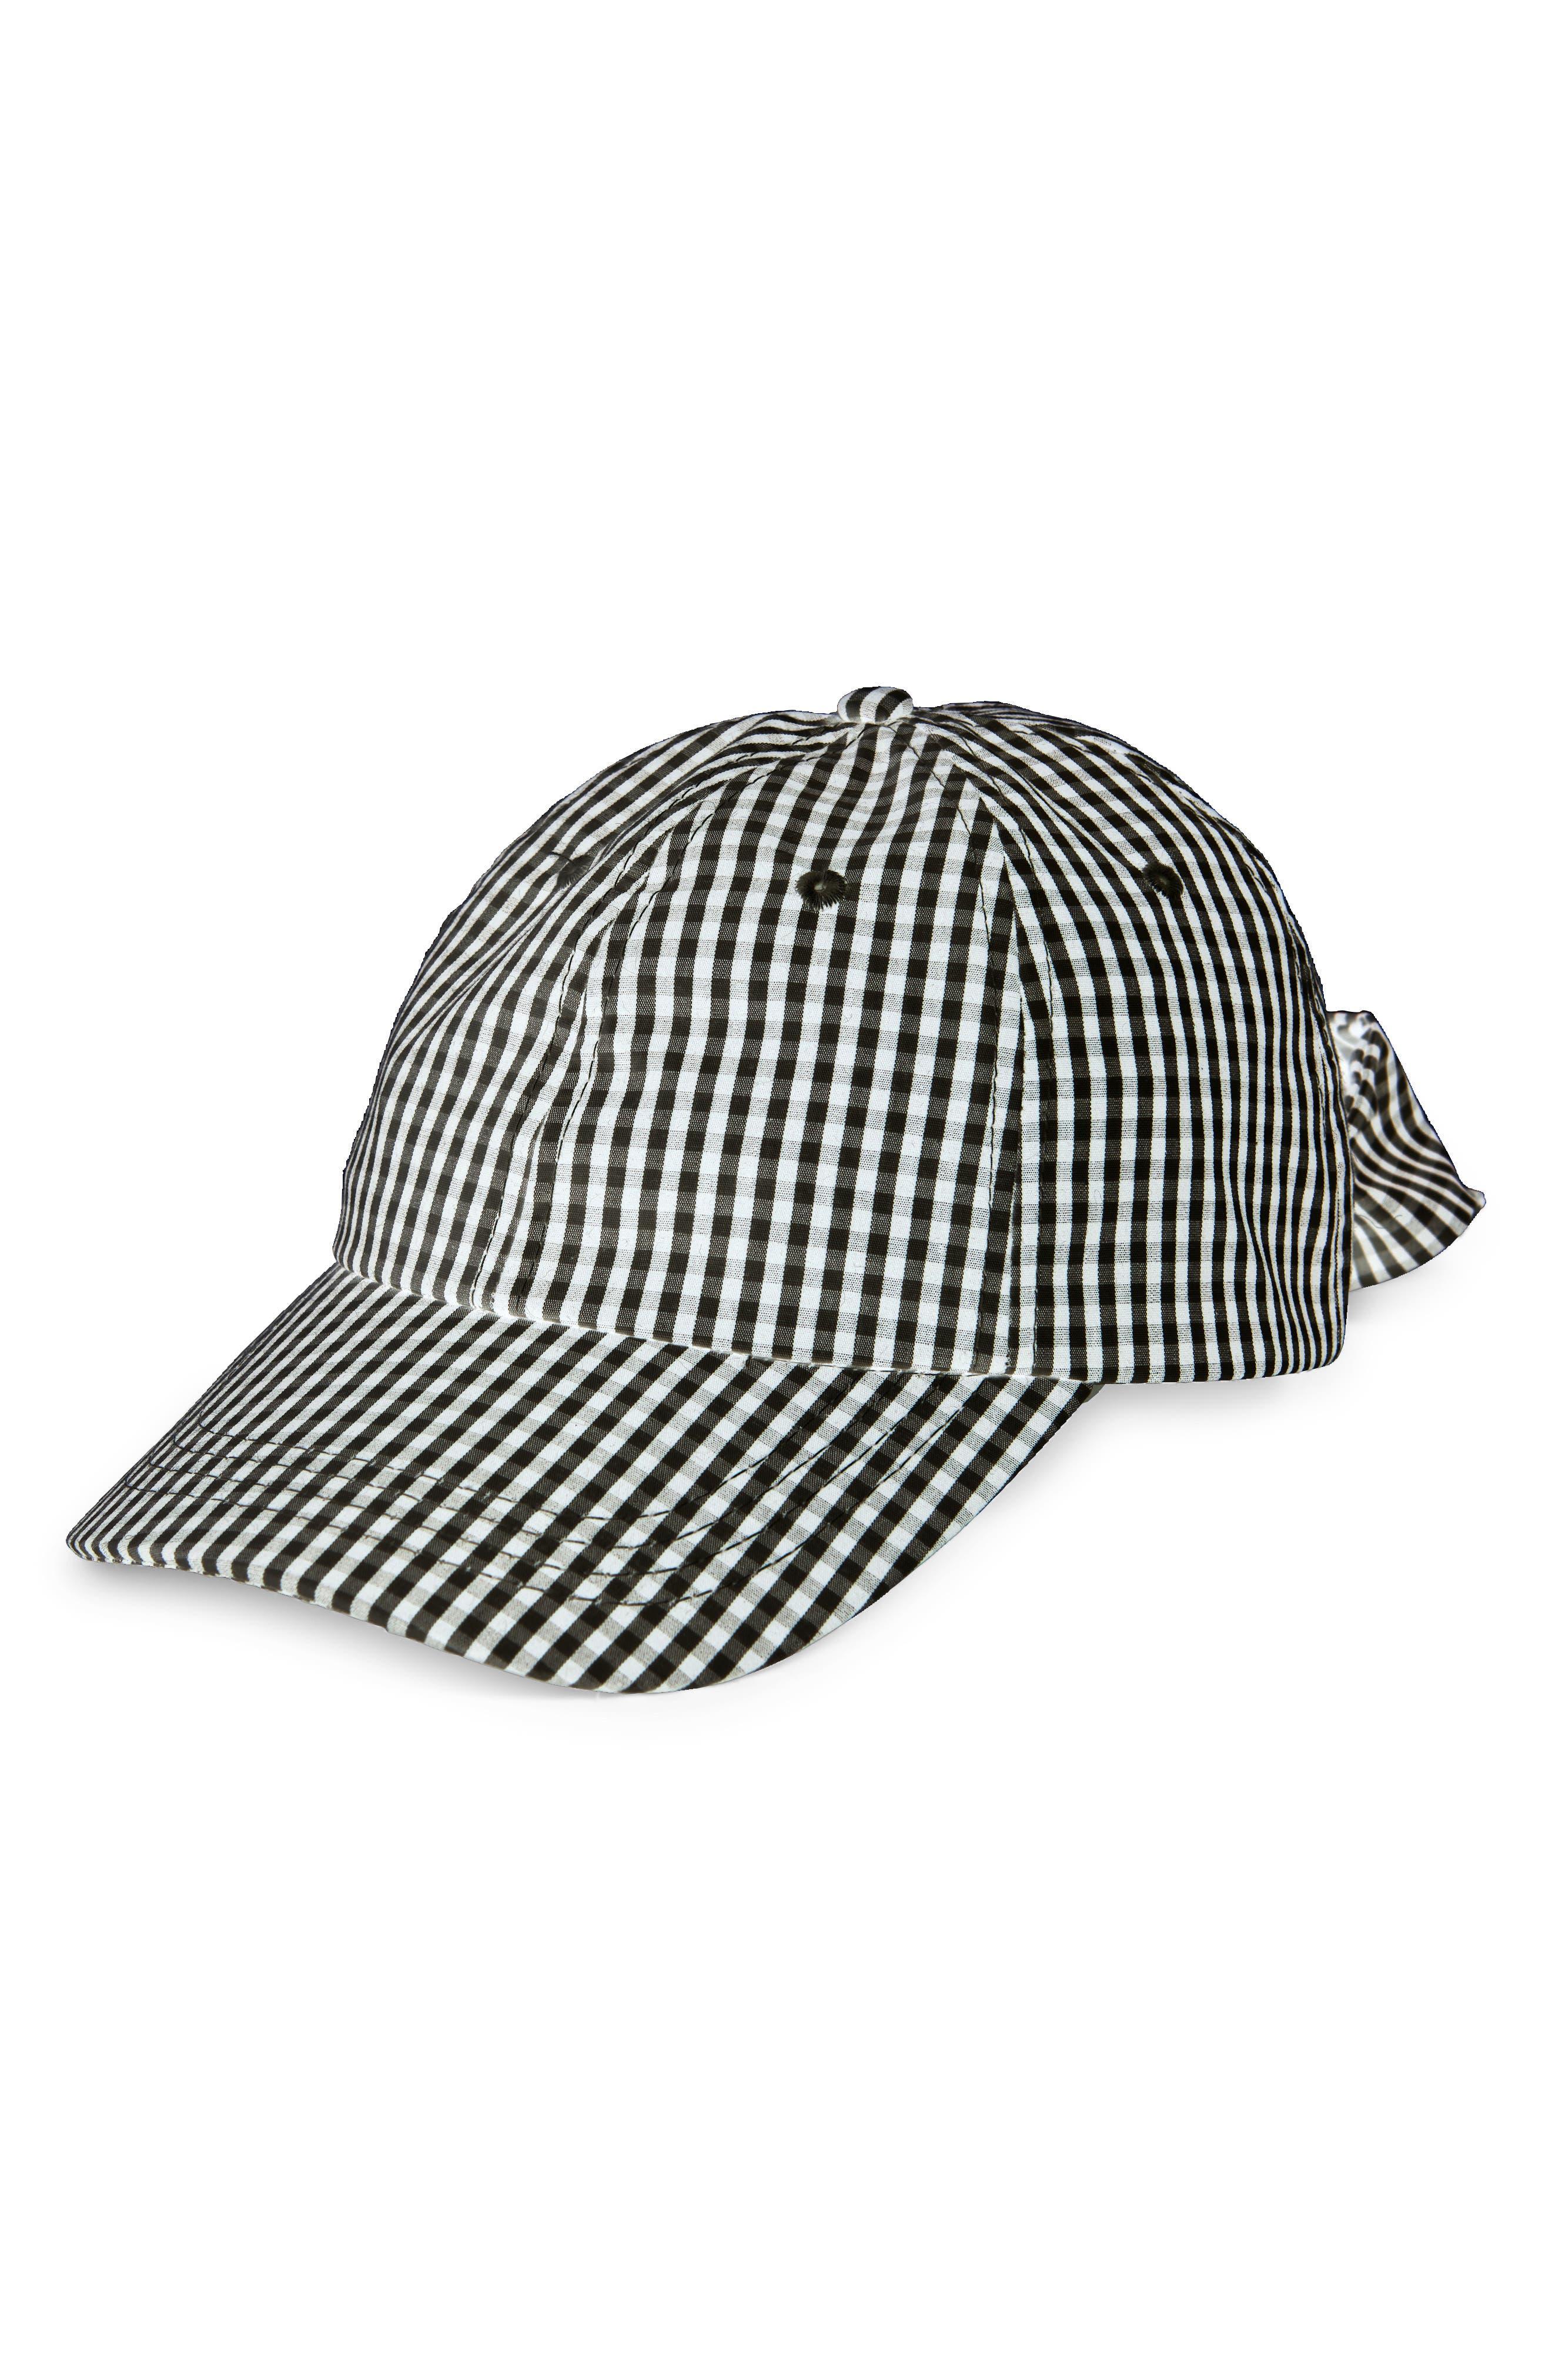 Bp. Caps GINGHAM BOW CAP